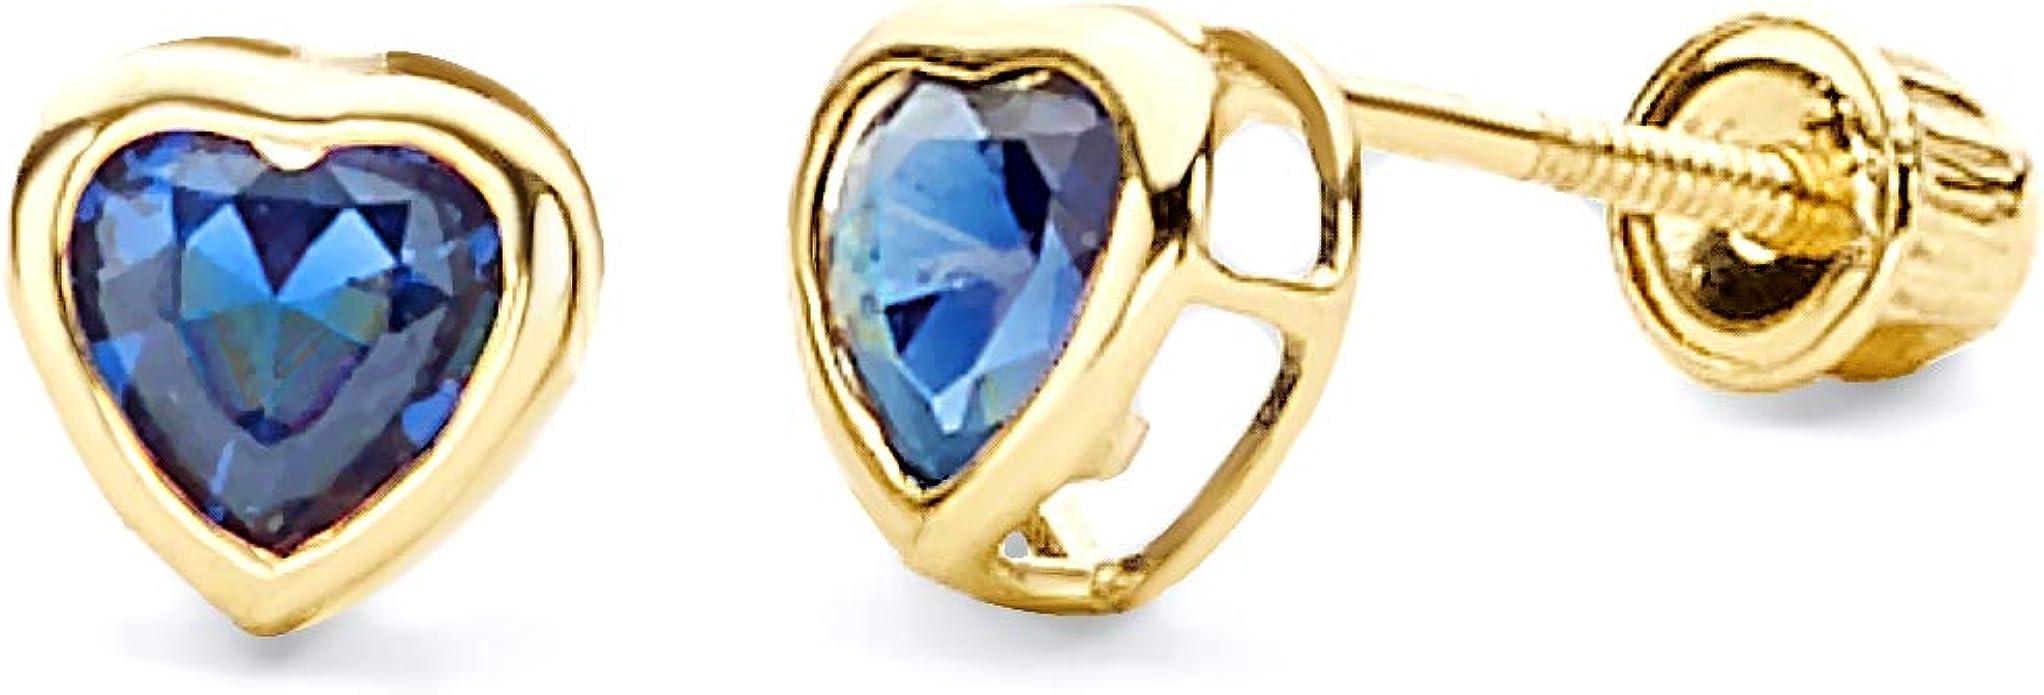 Wellingsale 14K Yellow Gold Polished Flower Birth CZ Cubic Zirconia Stone Stud Earrings With Screw Back July